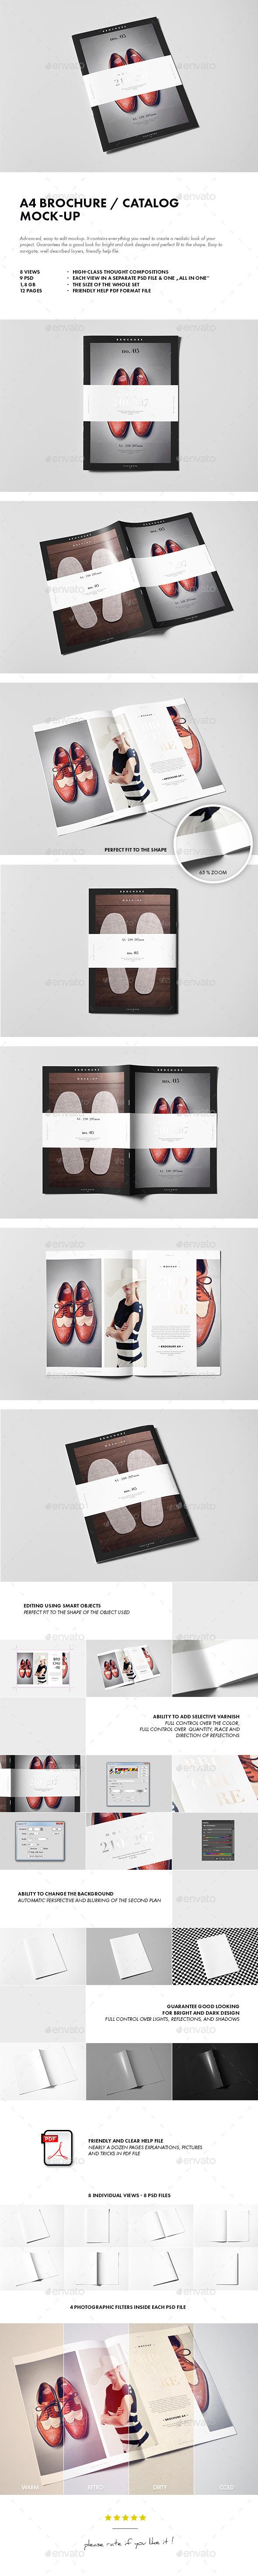 A4 Brochure / Catalog / Booklet Mock-up - Brochures Print